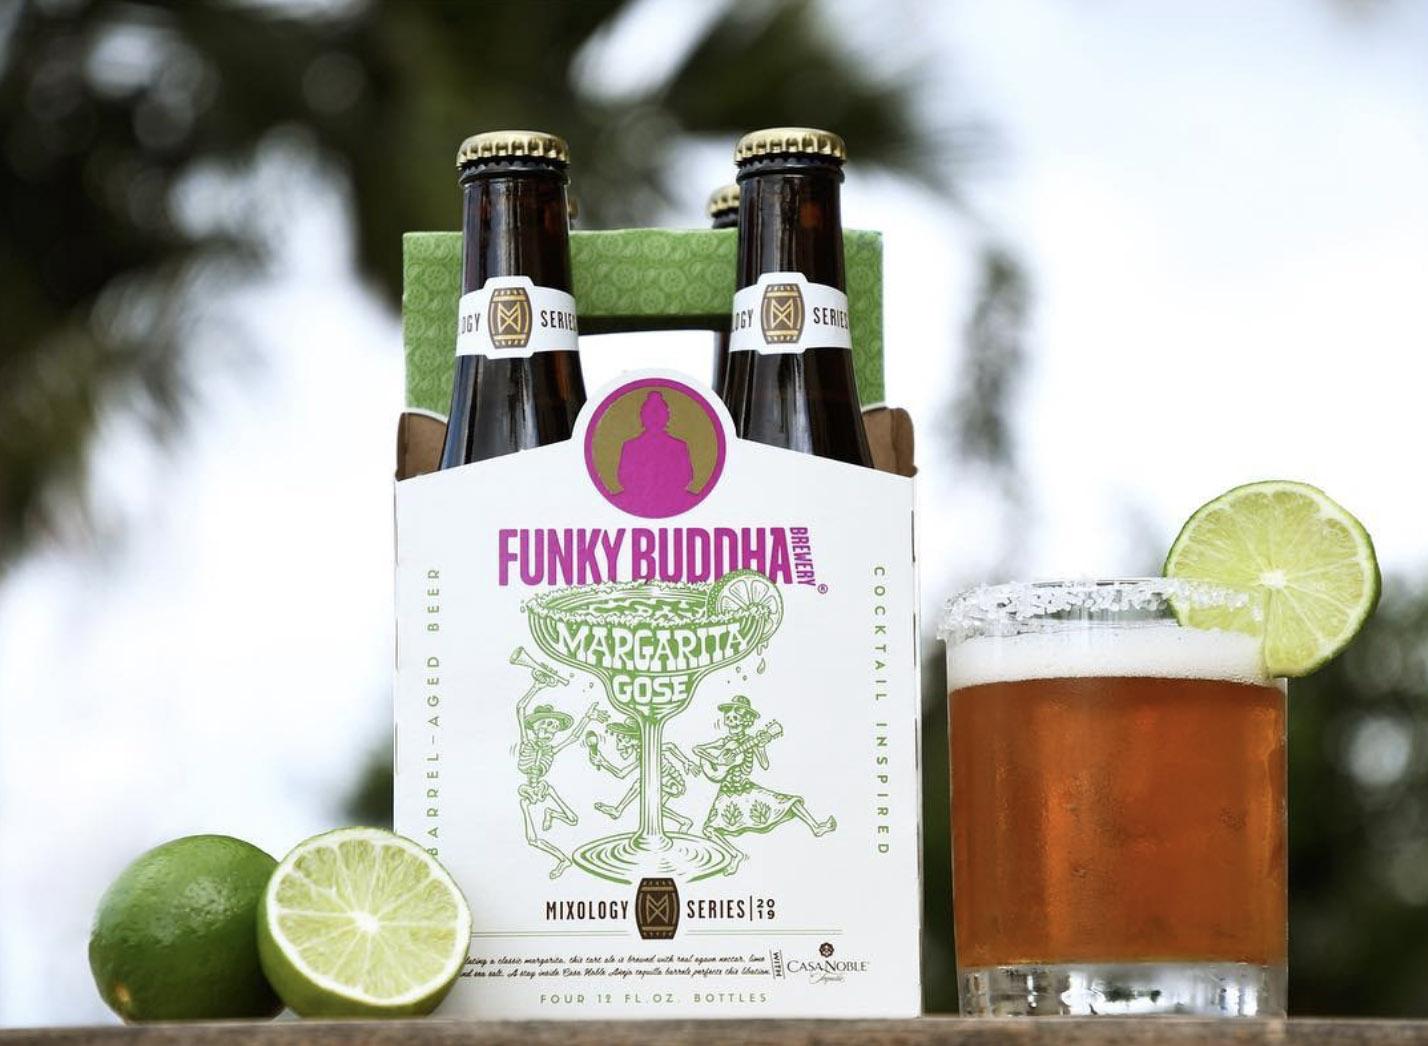 Photo by Funky Buddha Brewery